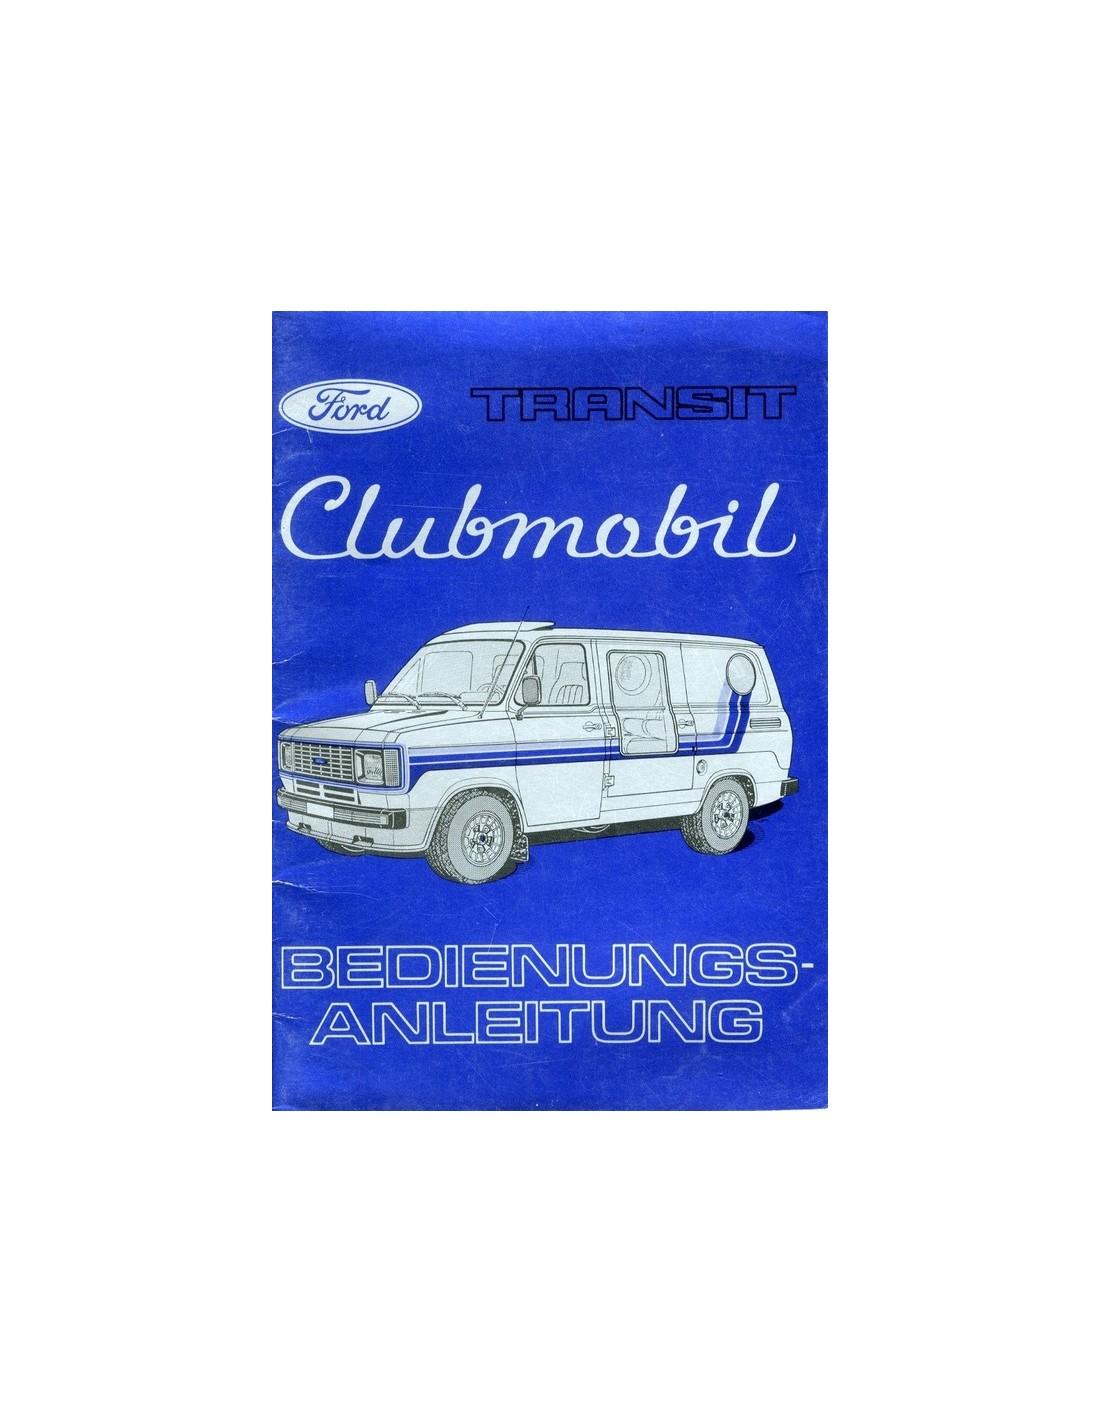 1980 ford transit clubmobil owners manual handbook german rh autolit eu transit owners manual pdf 2008 ford transit owner's manual